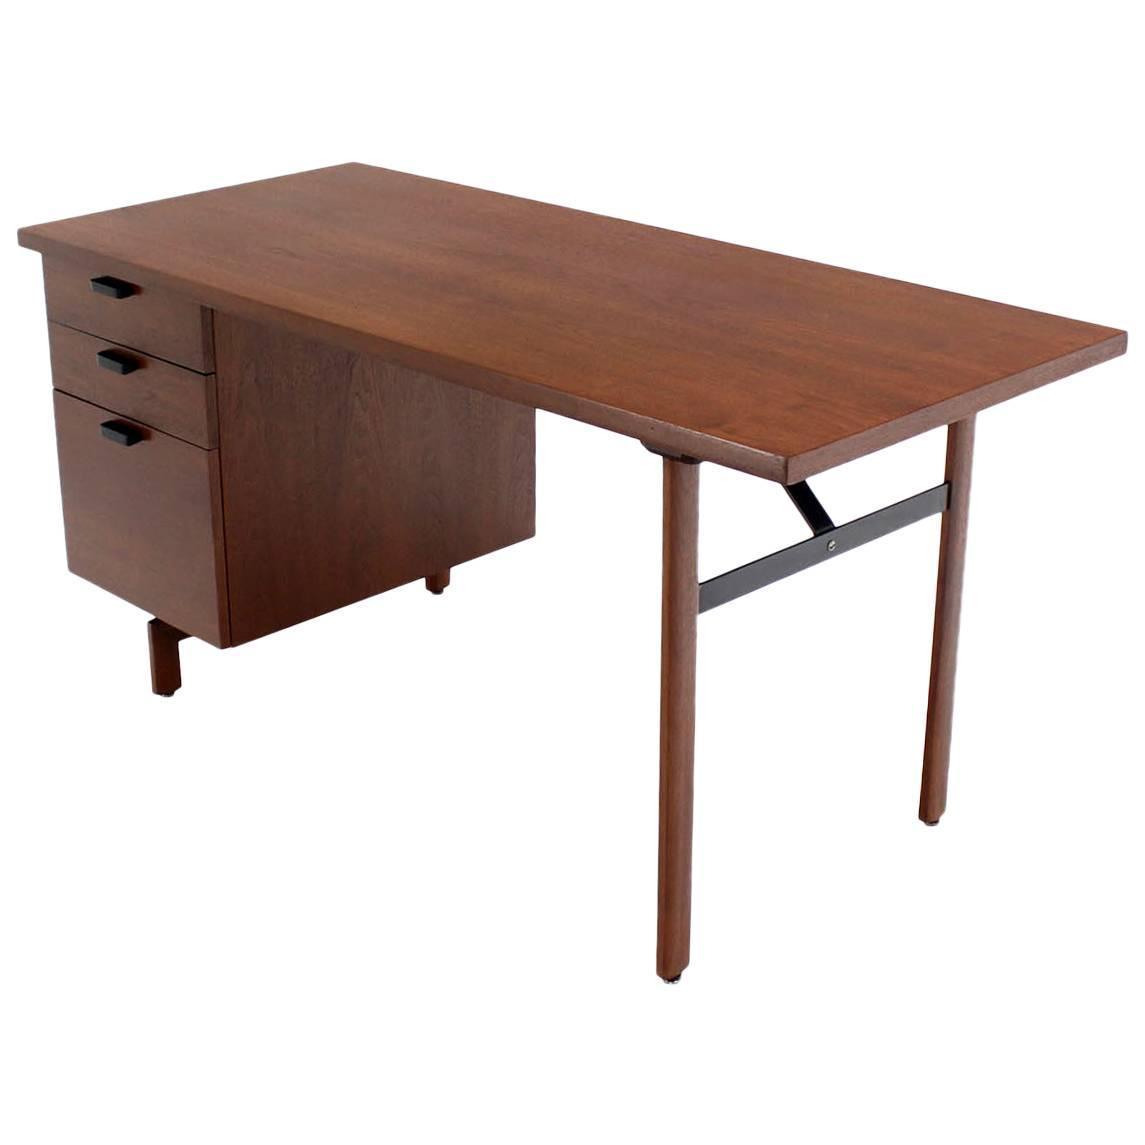 Mid Century Modern Desk: Mid-Century Modern Walnut Desk For Sale At 1stdibs